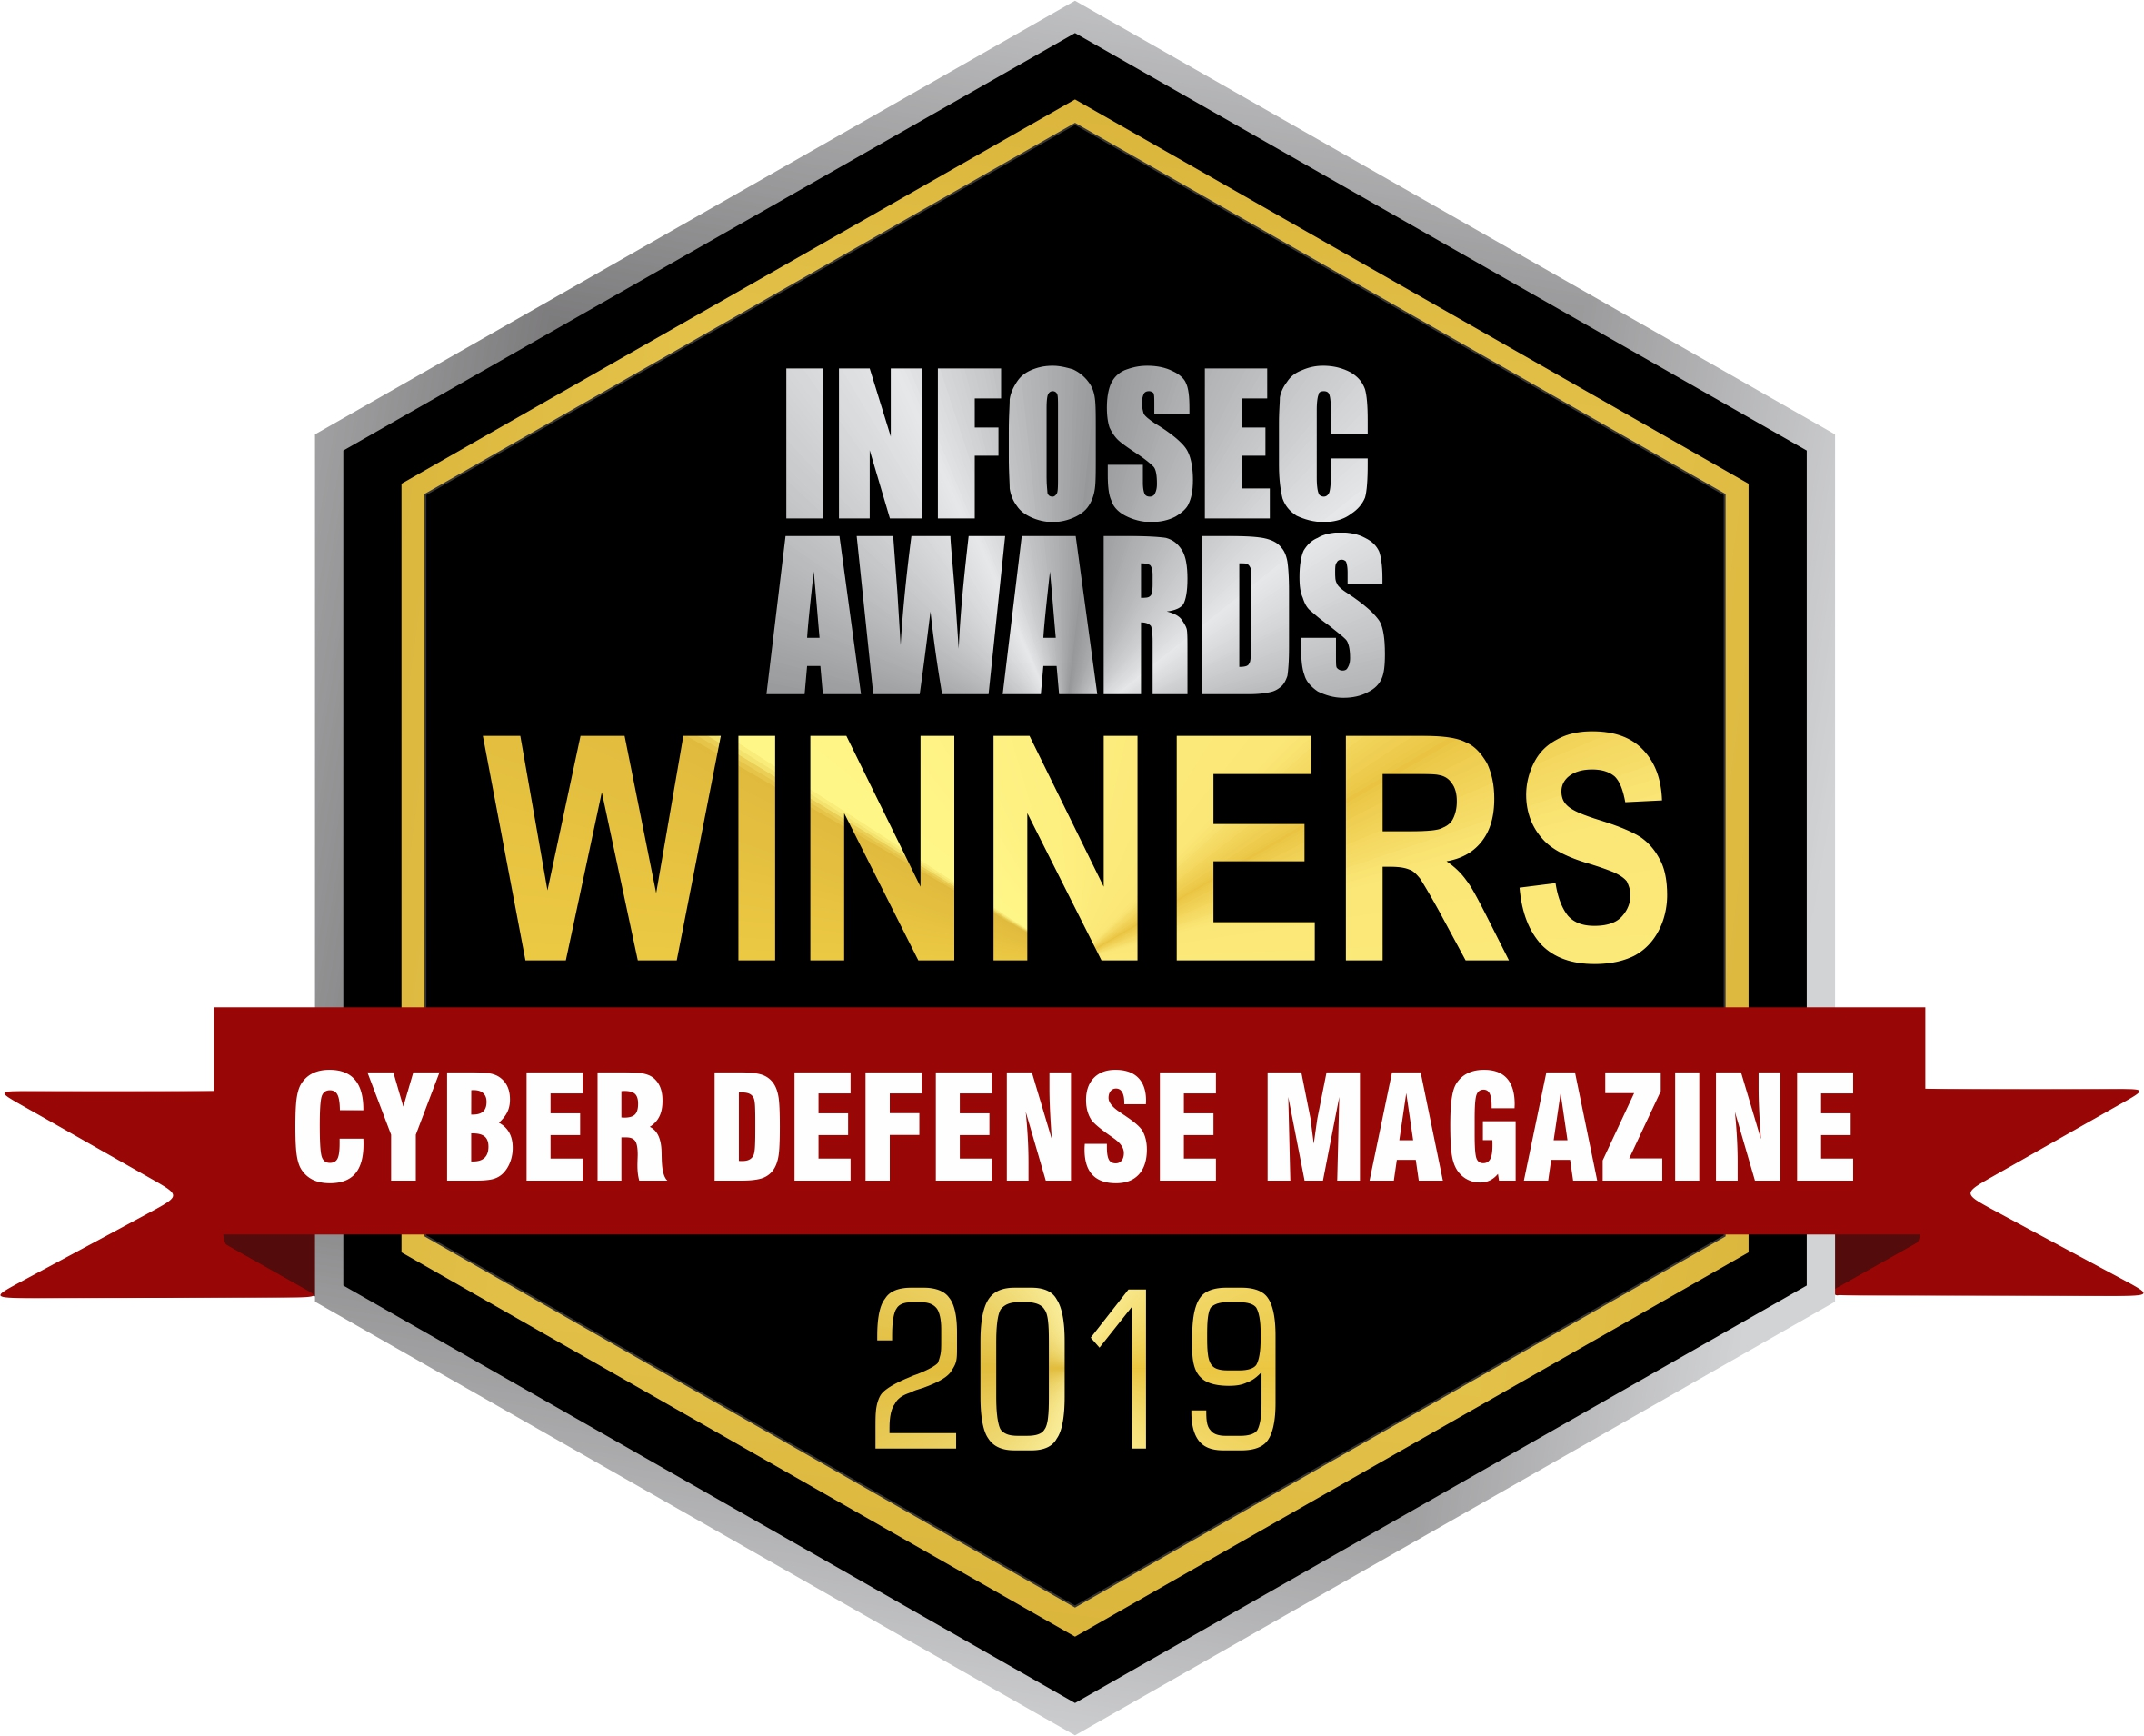 InfoSec Awards Winners 2019 | Cyber Defense Awards